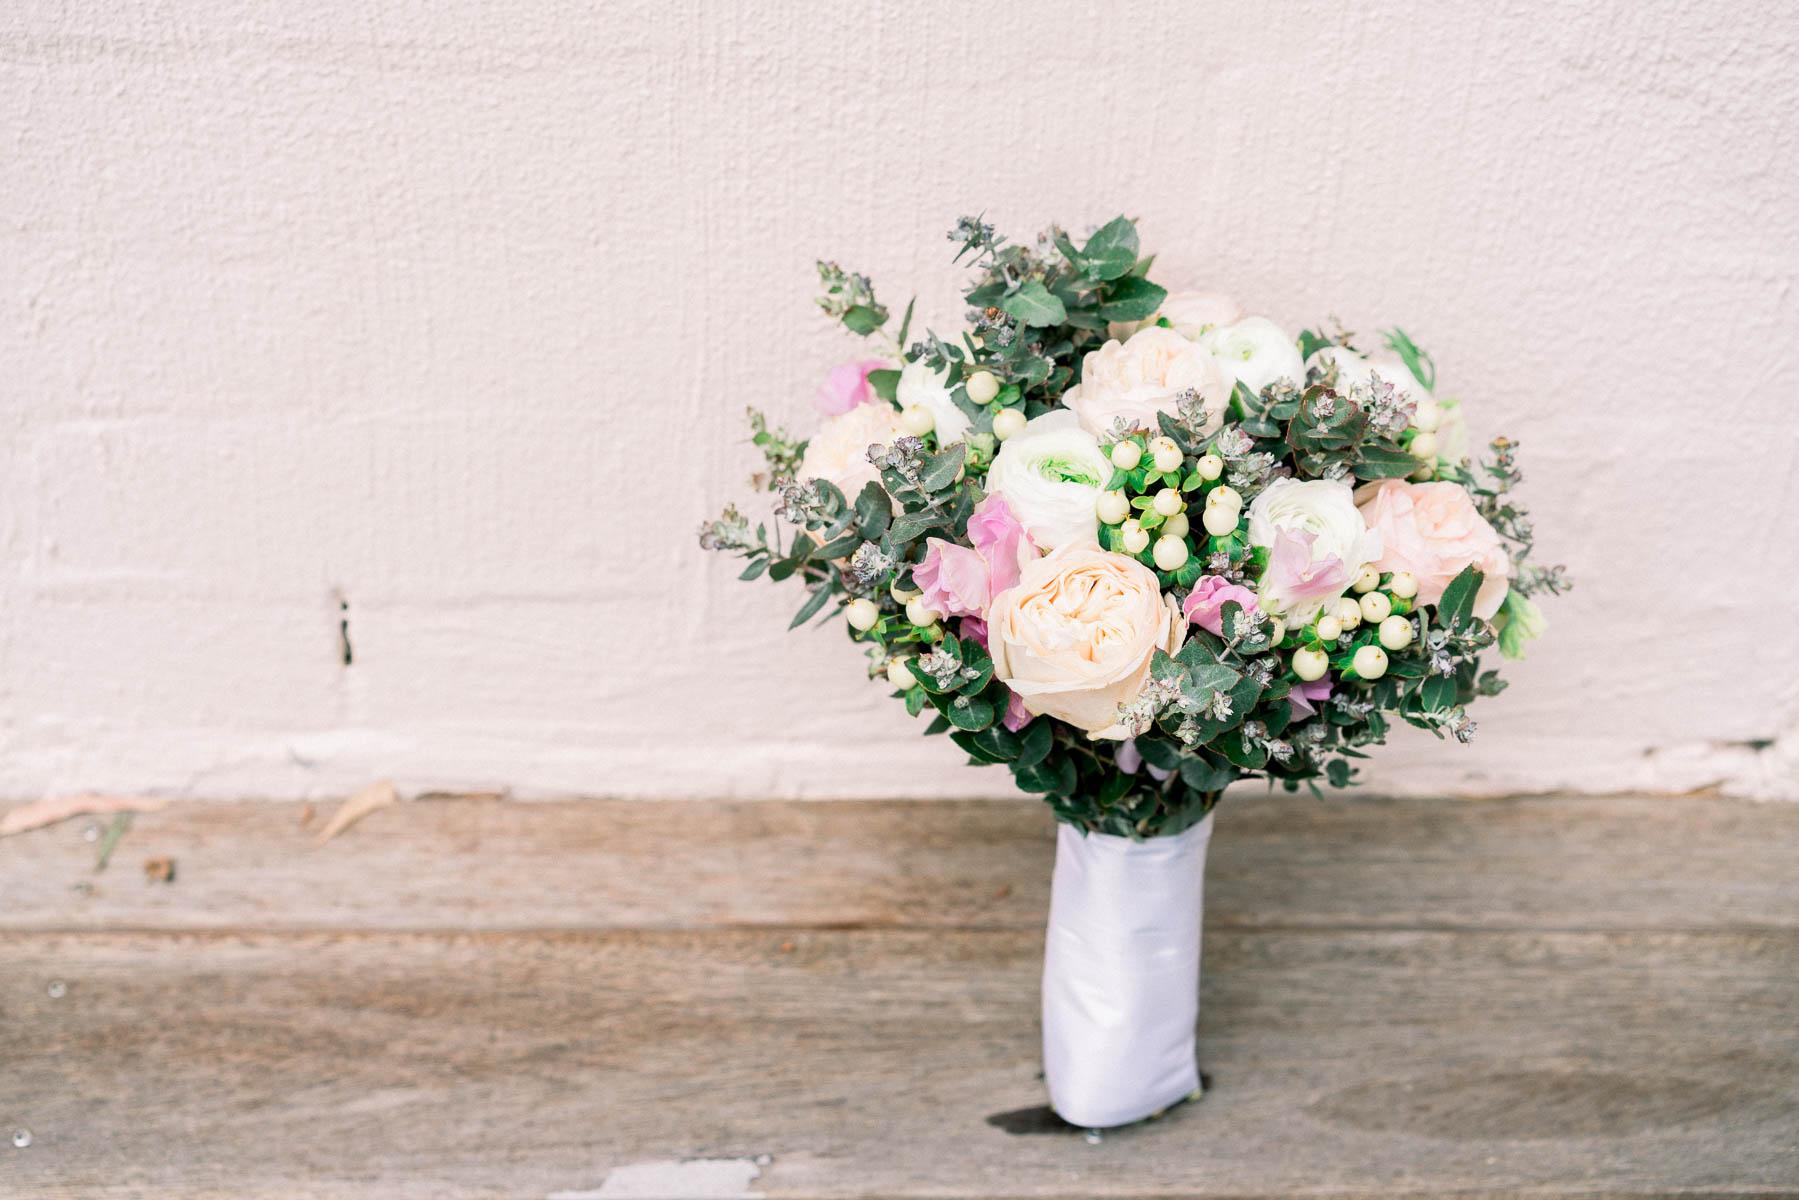 lindenderry-wedding-heart+soul-weddings-amy-alain-02957.jpg